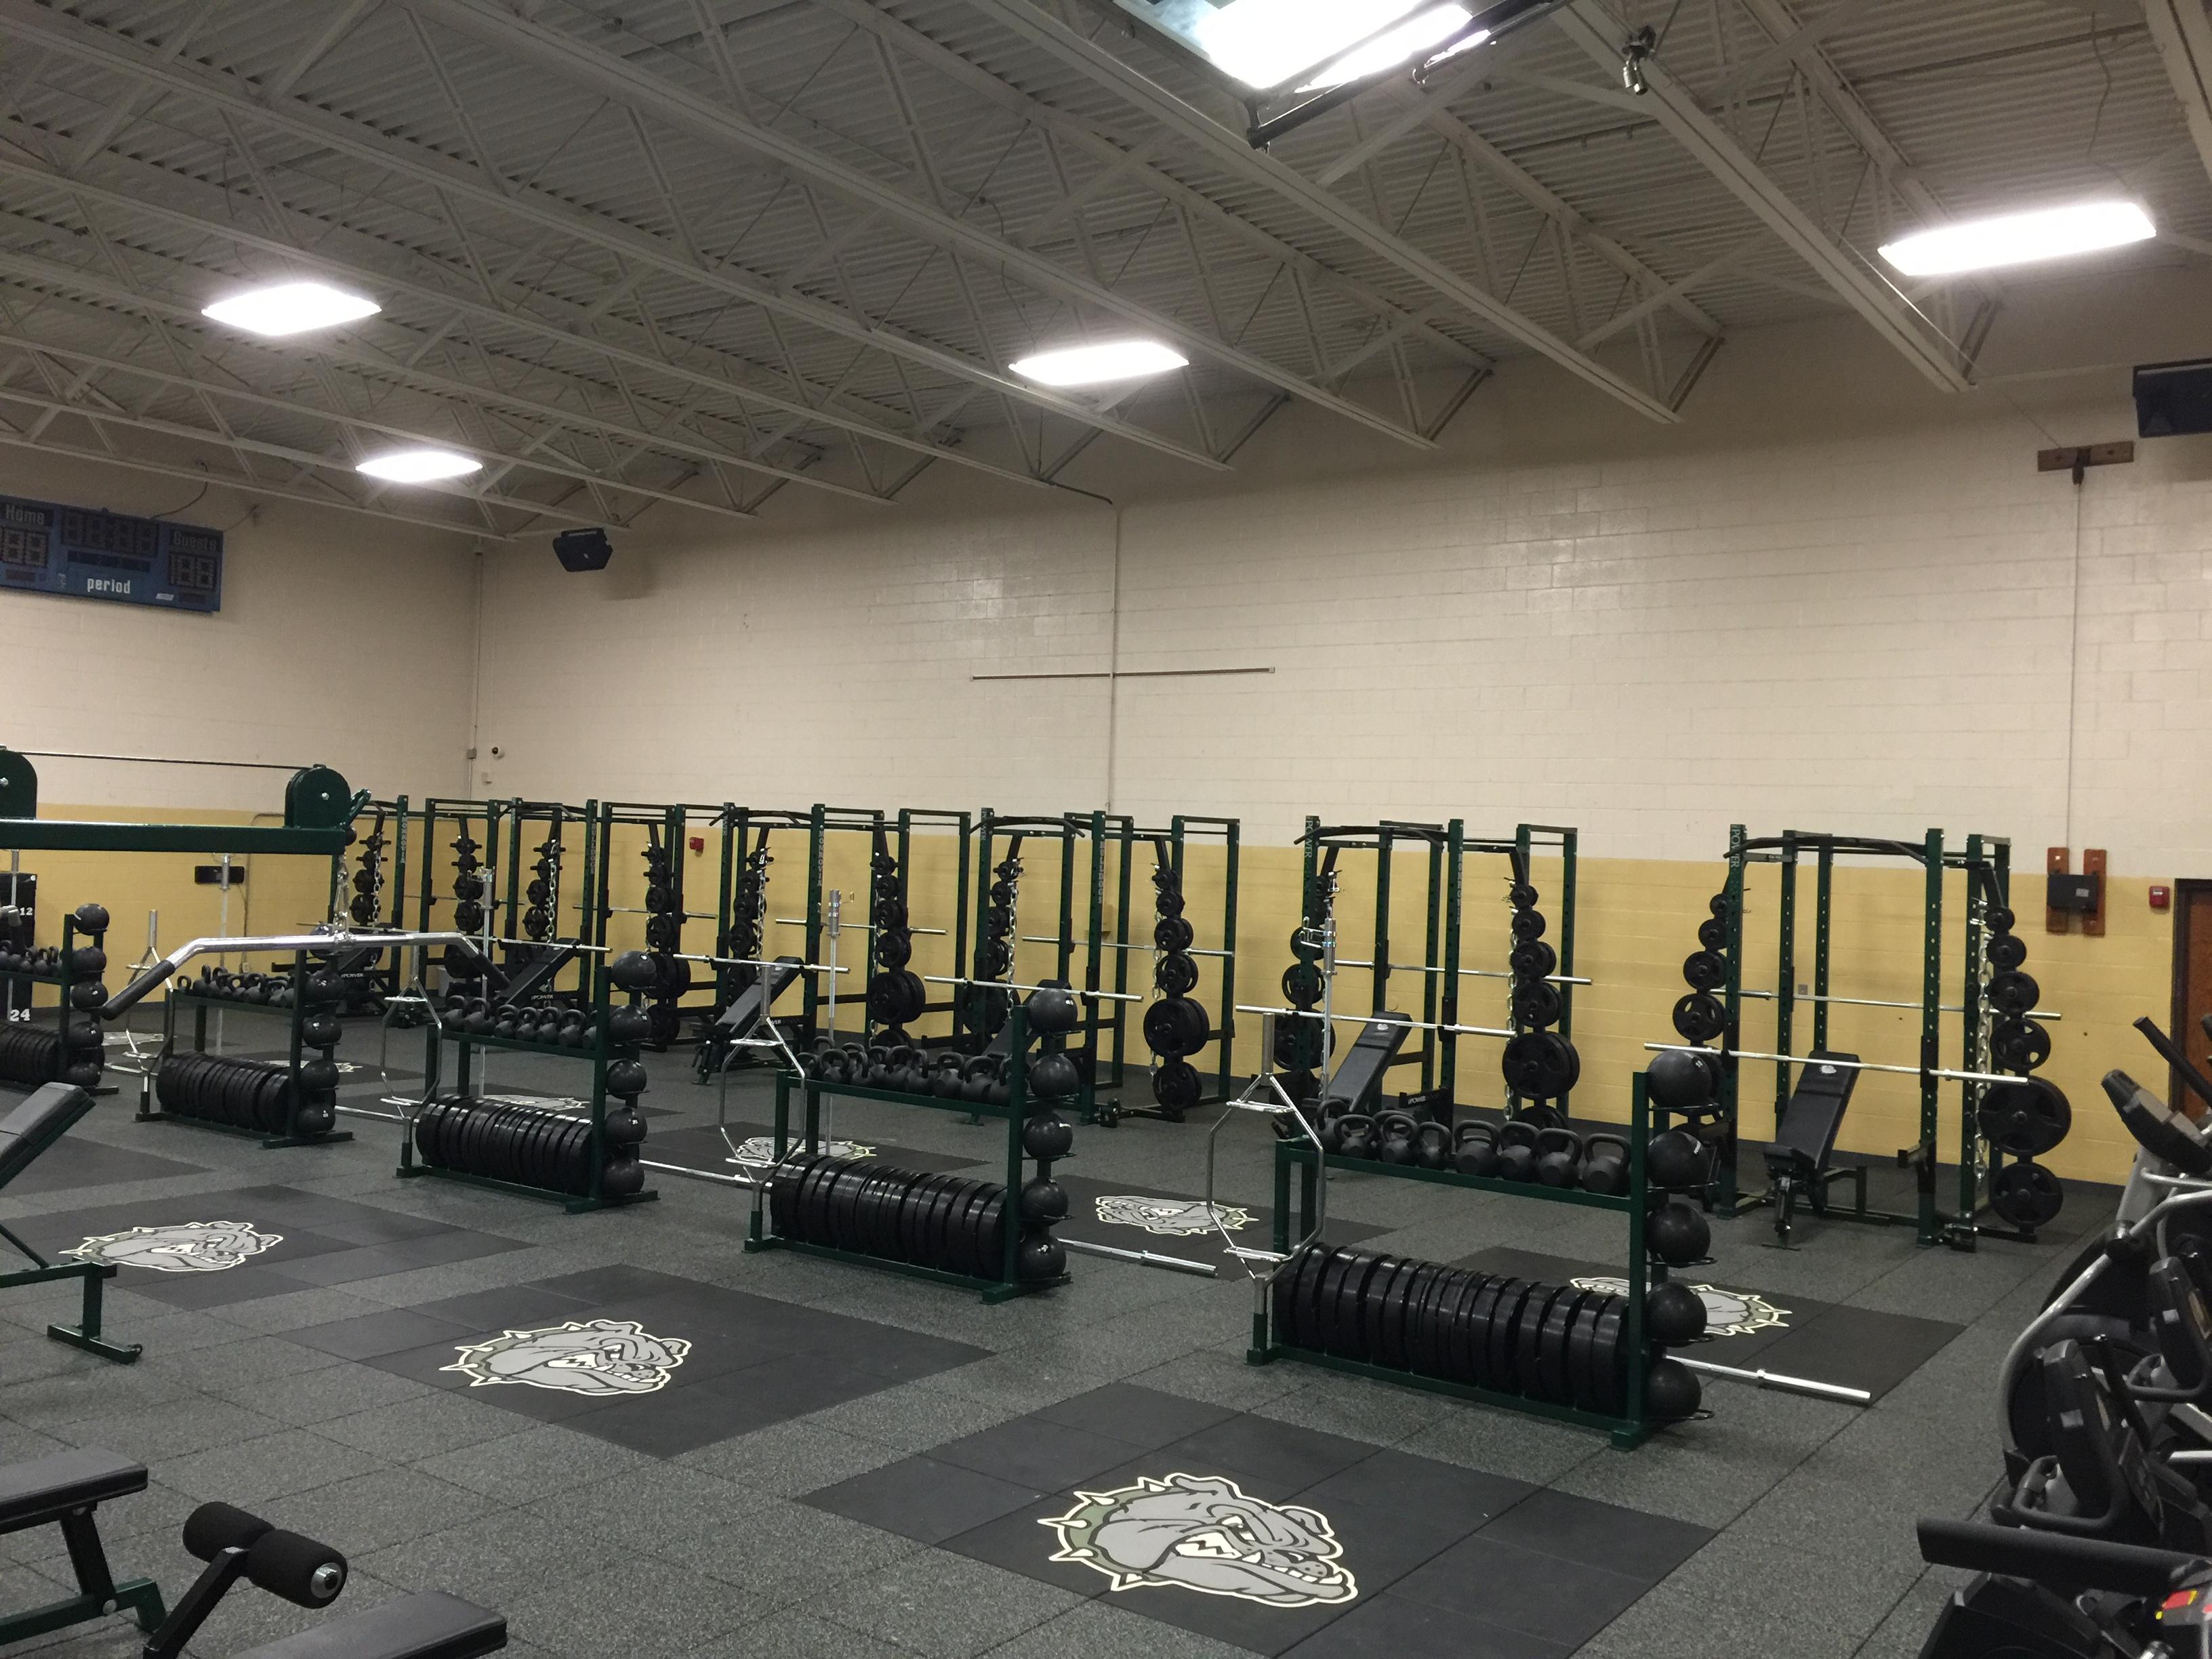 St michael albertville high school activity center donlar